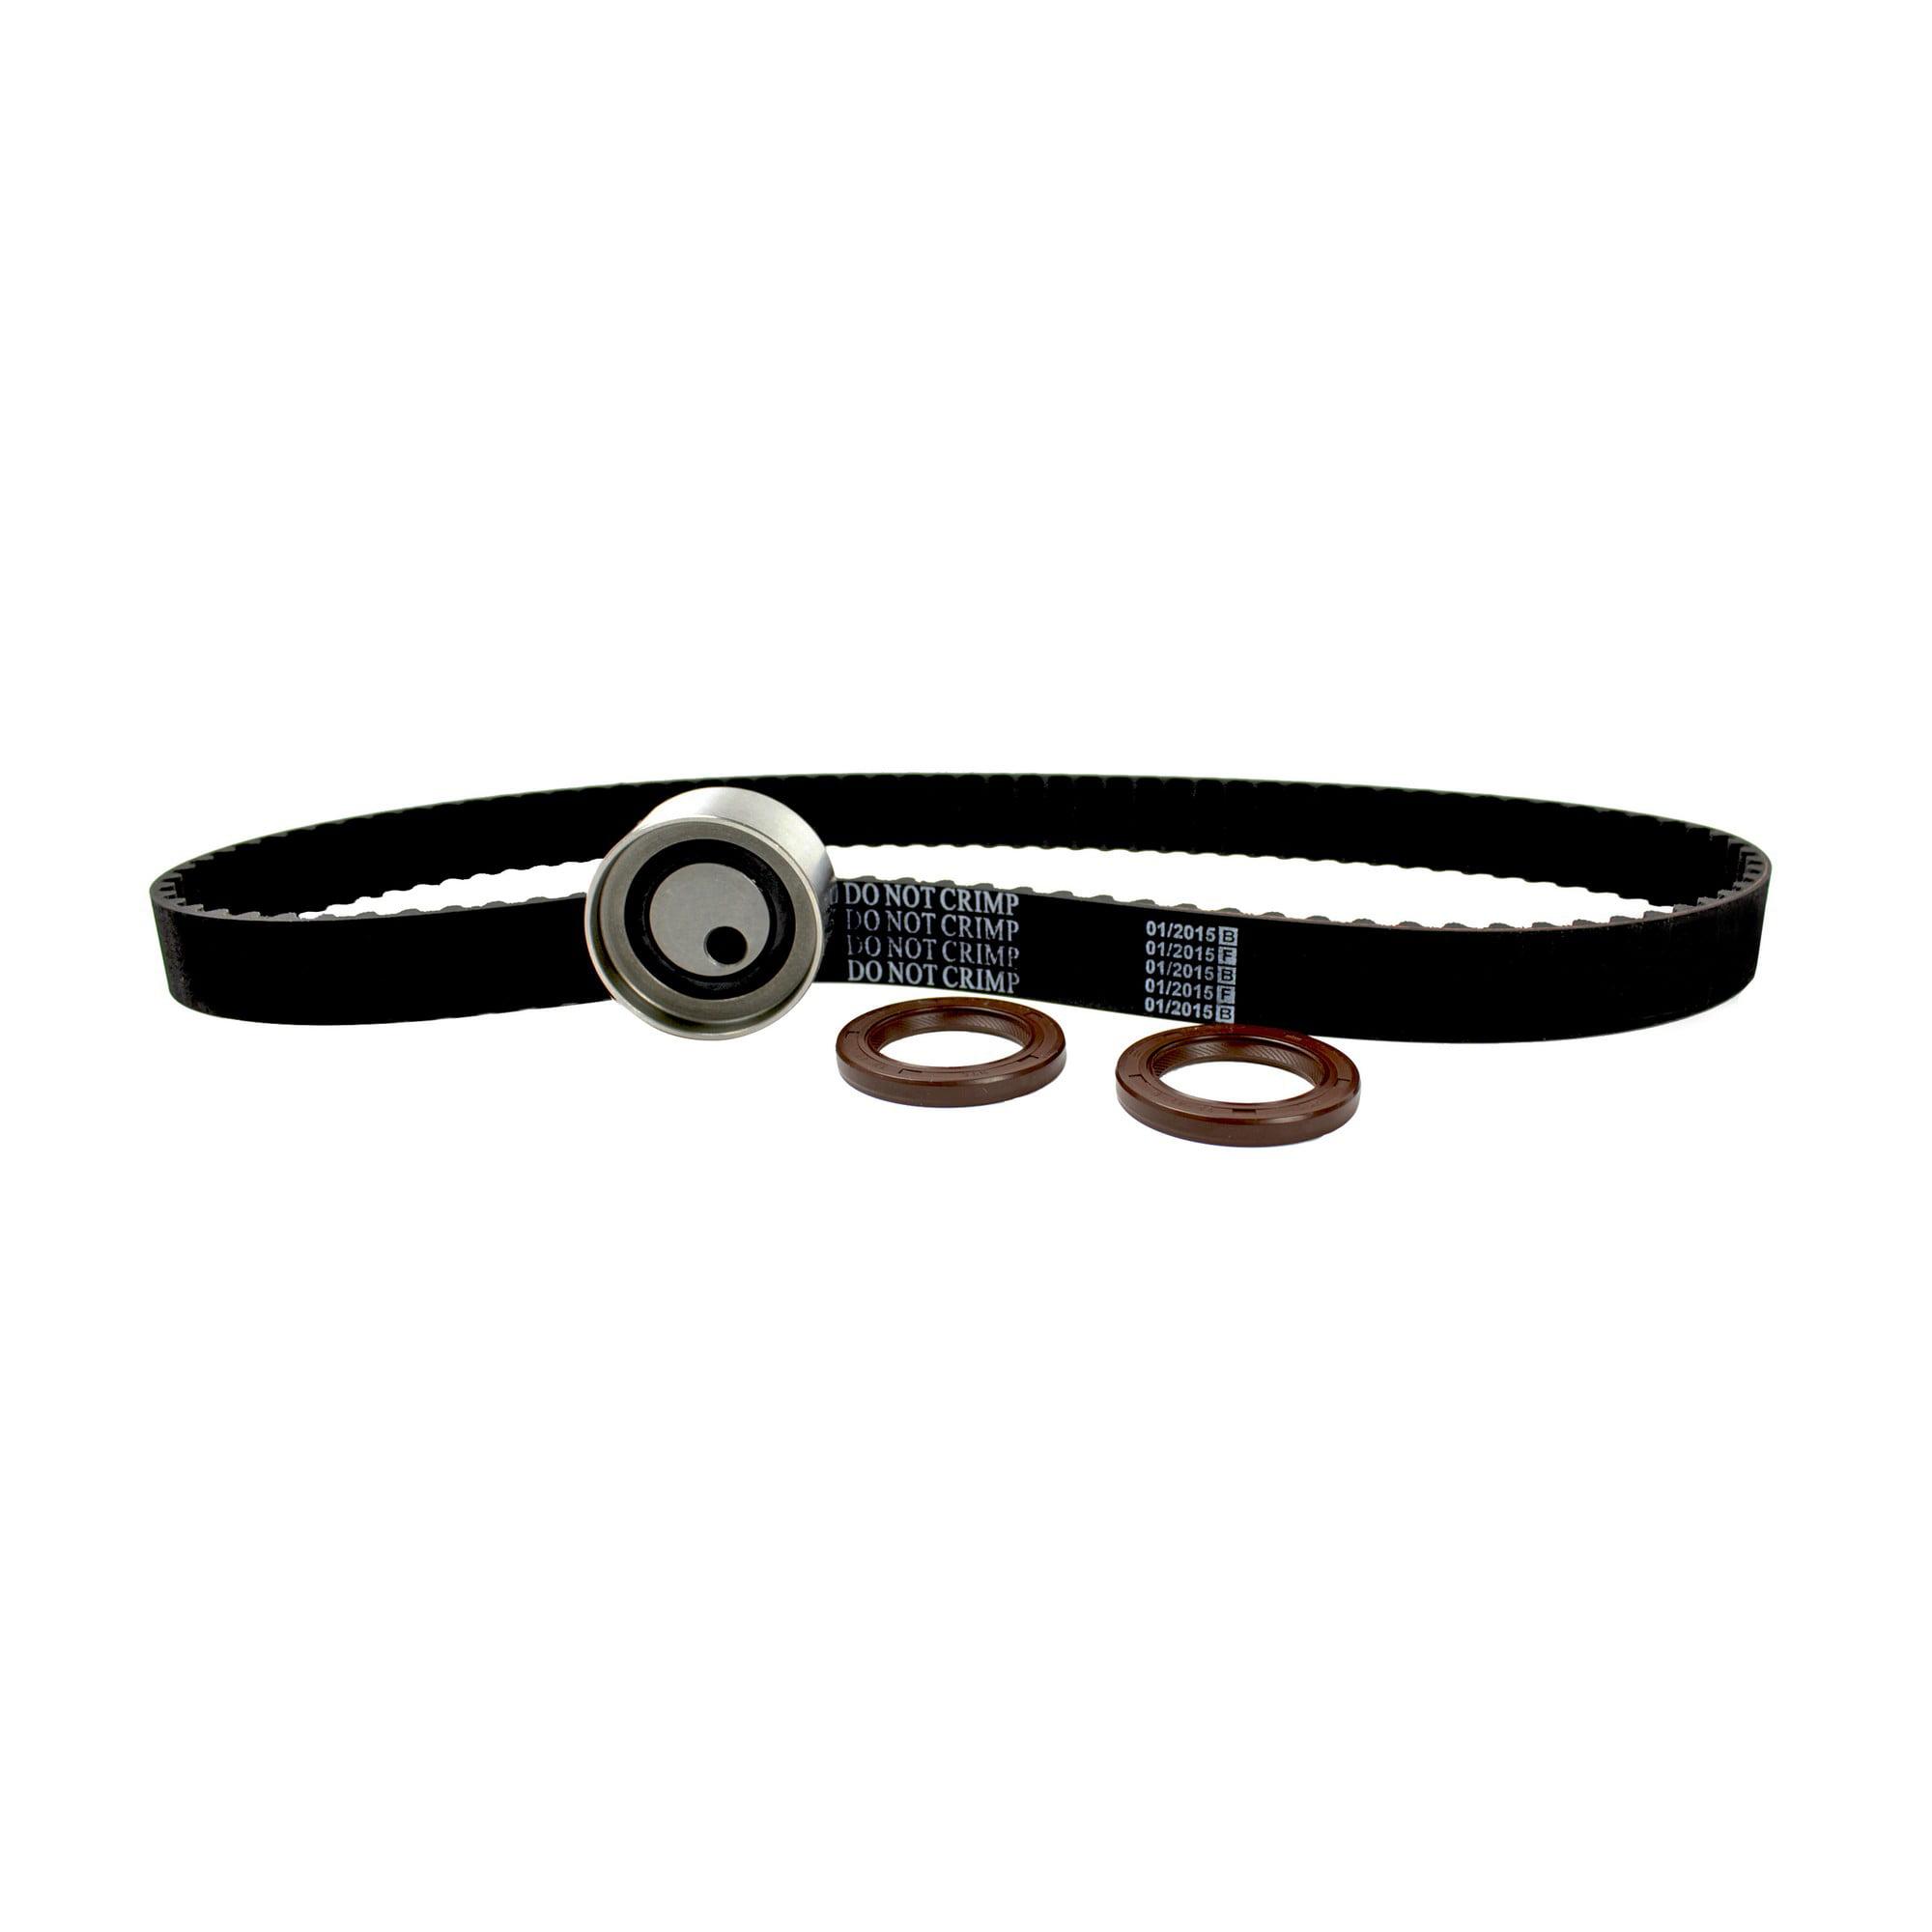 DNJ TBK530 Timing Belt Kit For 92-01 Geo Suzuki Esteem Sidekick 1.6L SOHC 16v